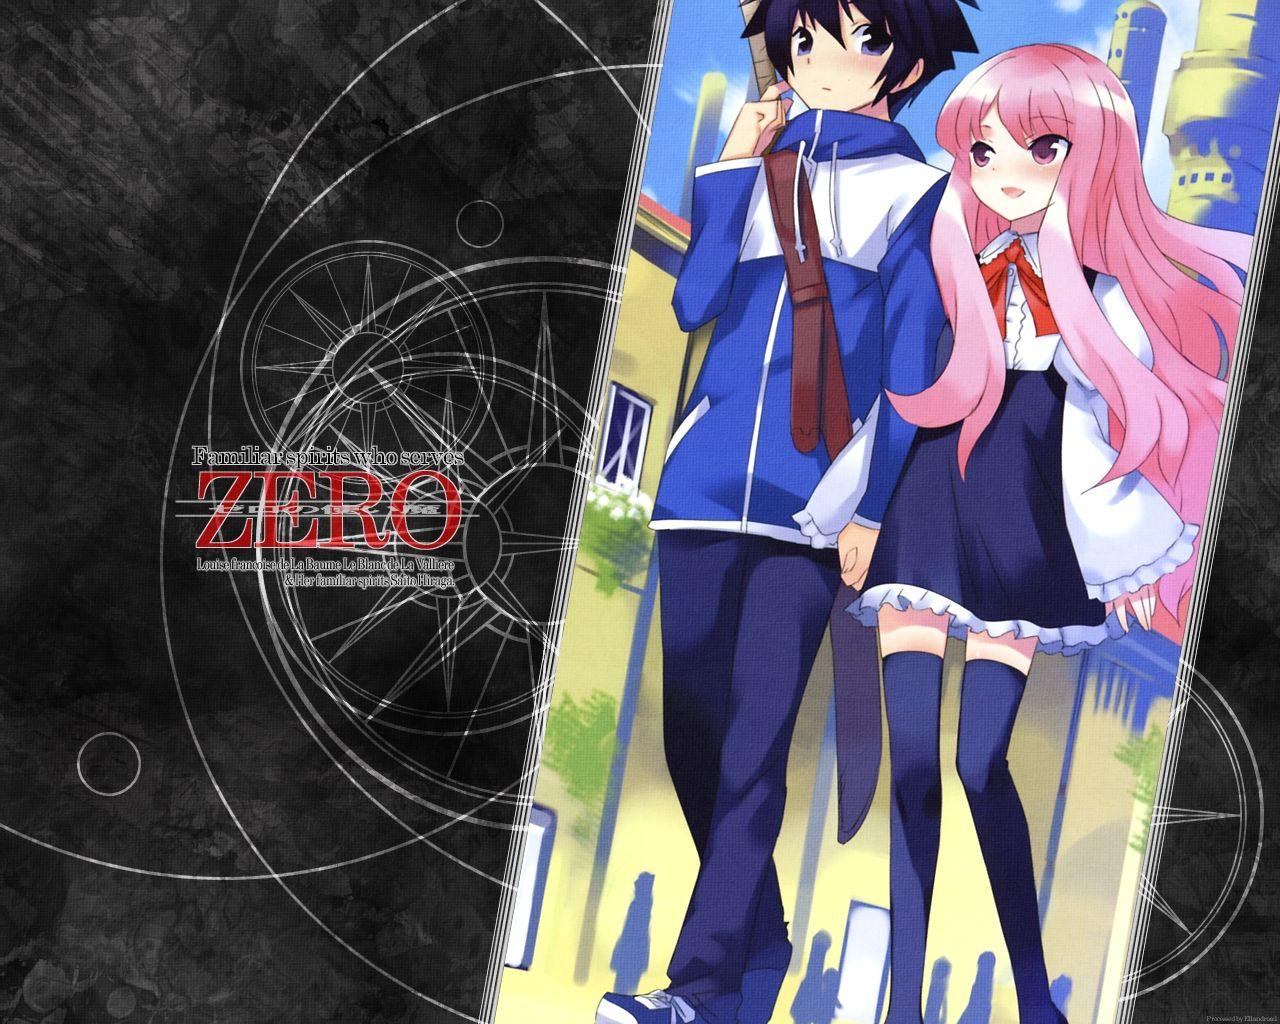 zeroNoTsukaimaSaison3_wallpaper_5826.jpg